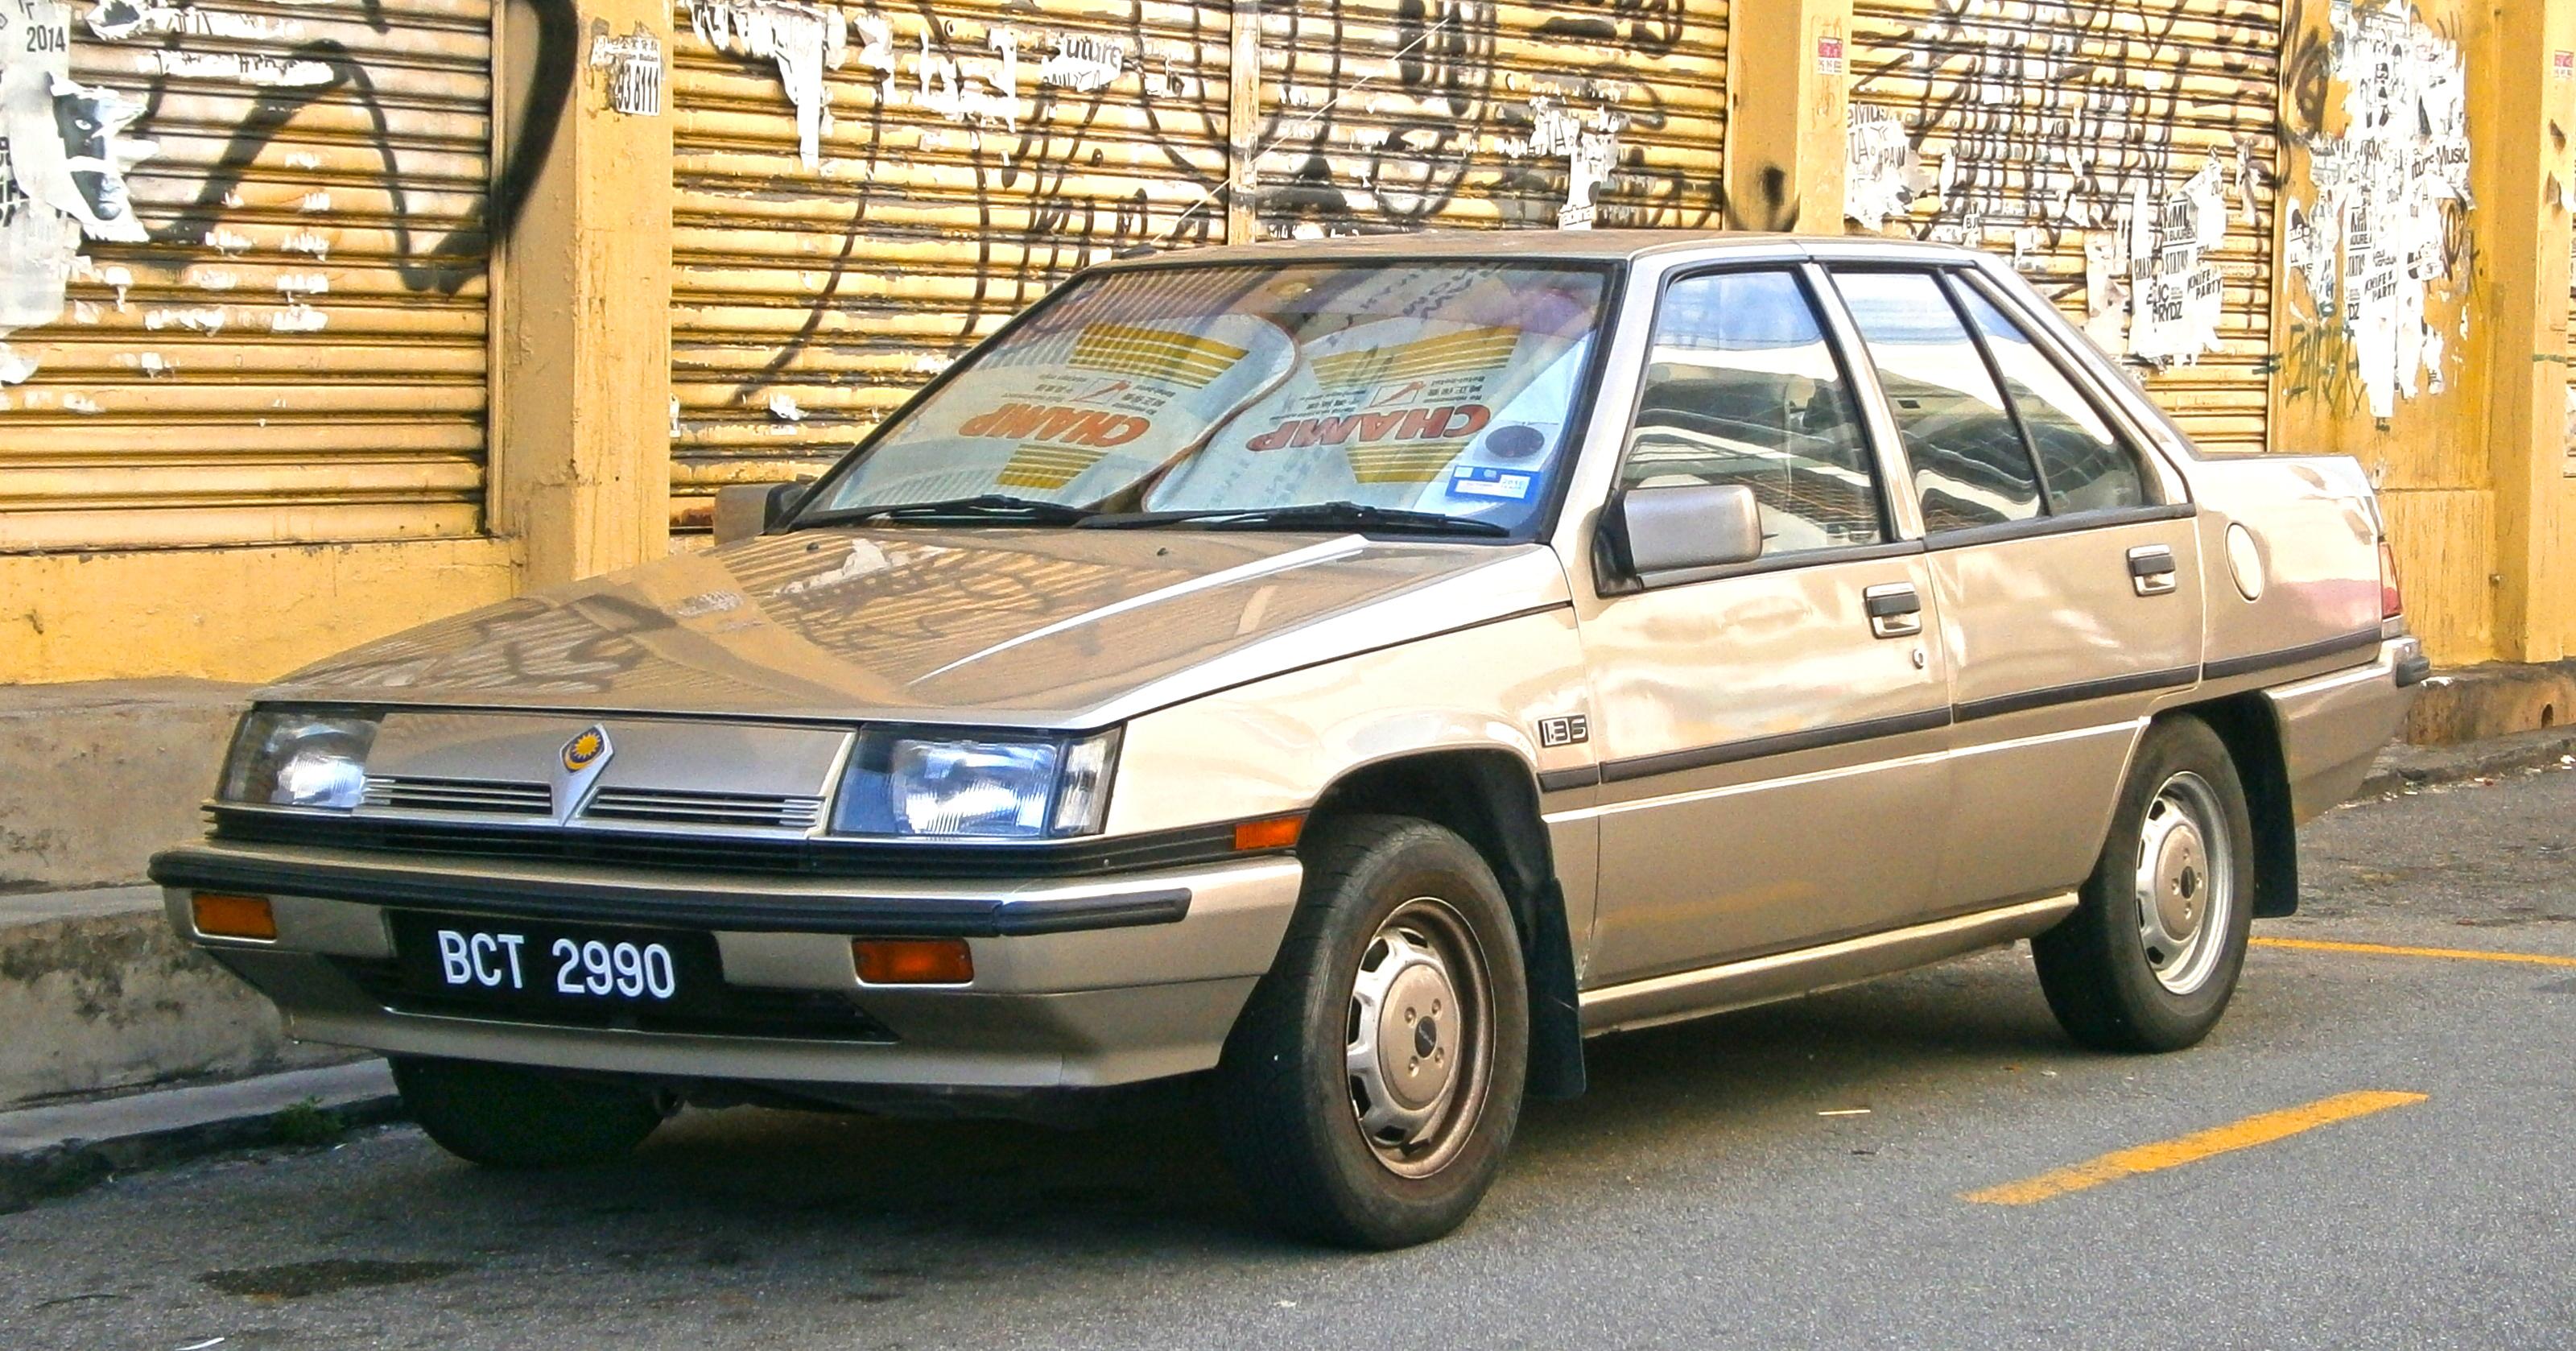 List of Proton car models - Wikipedia efe44c1e492